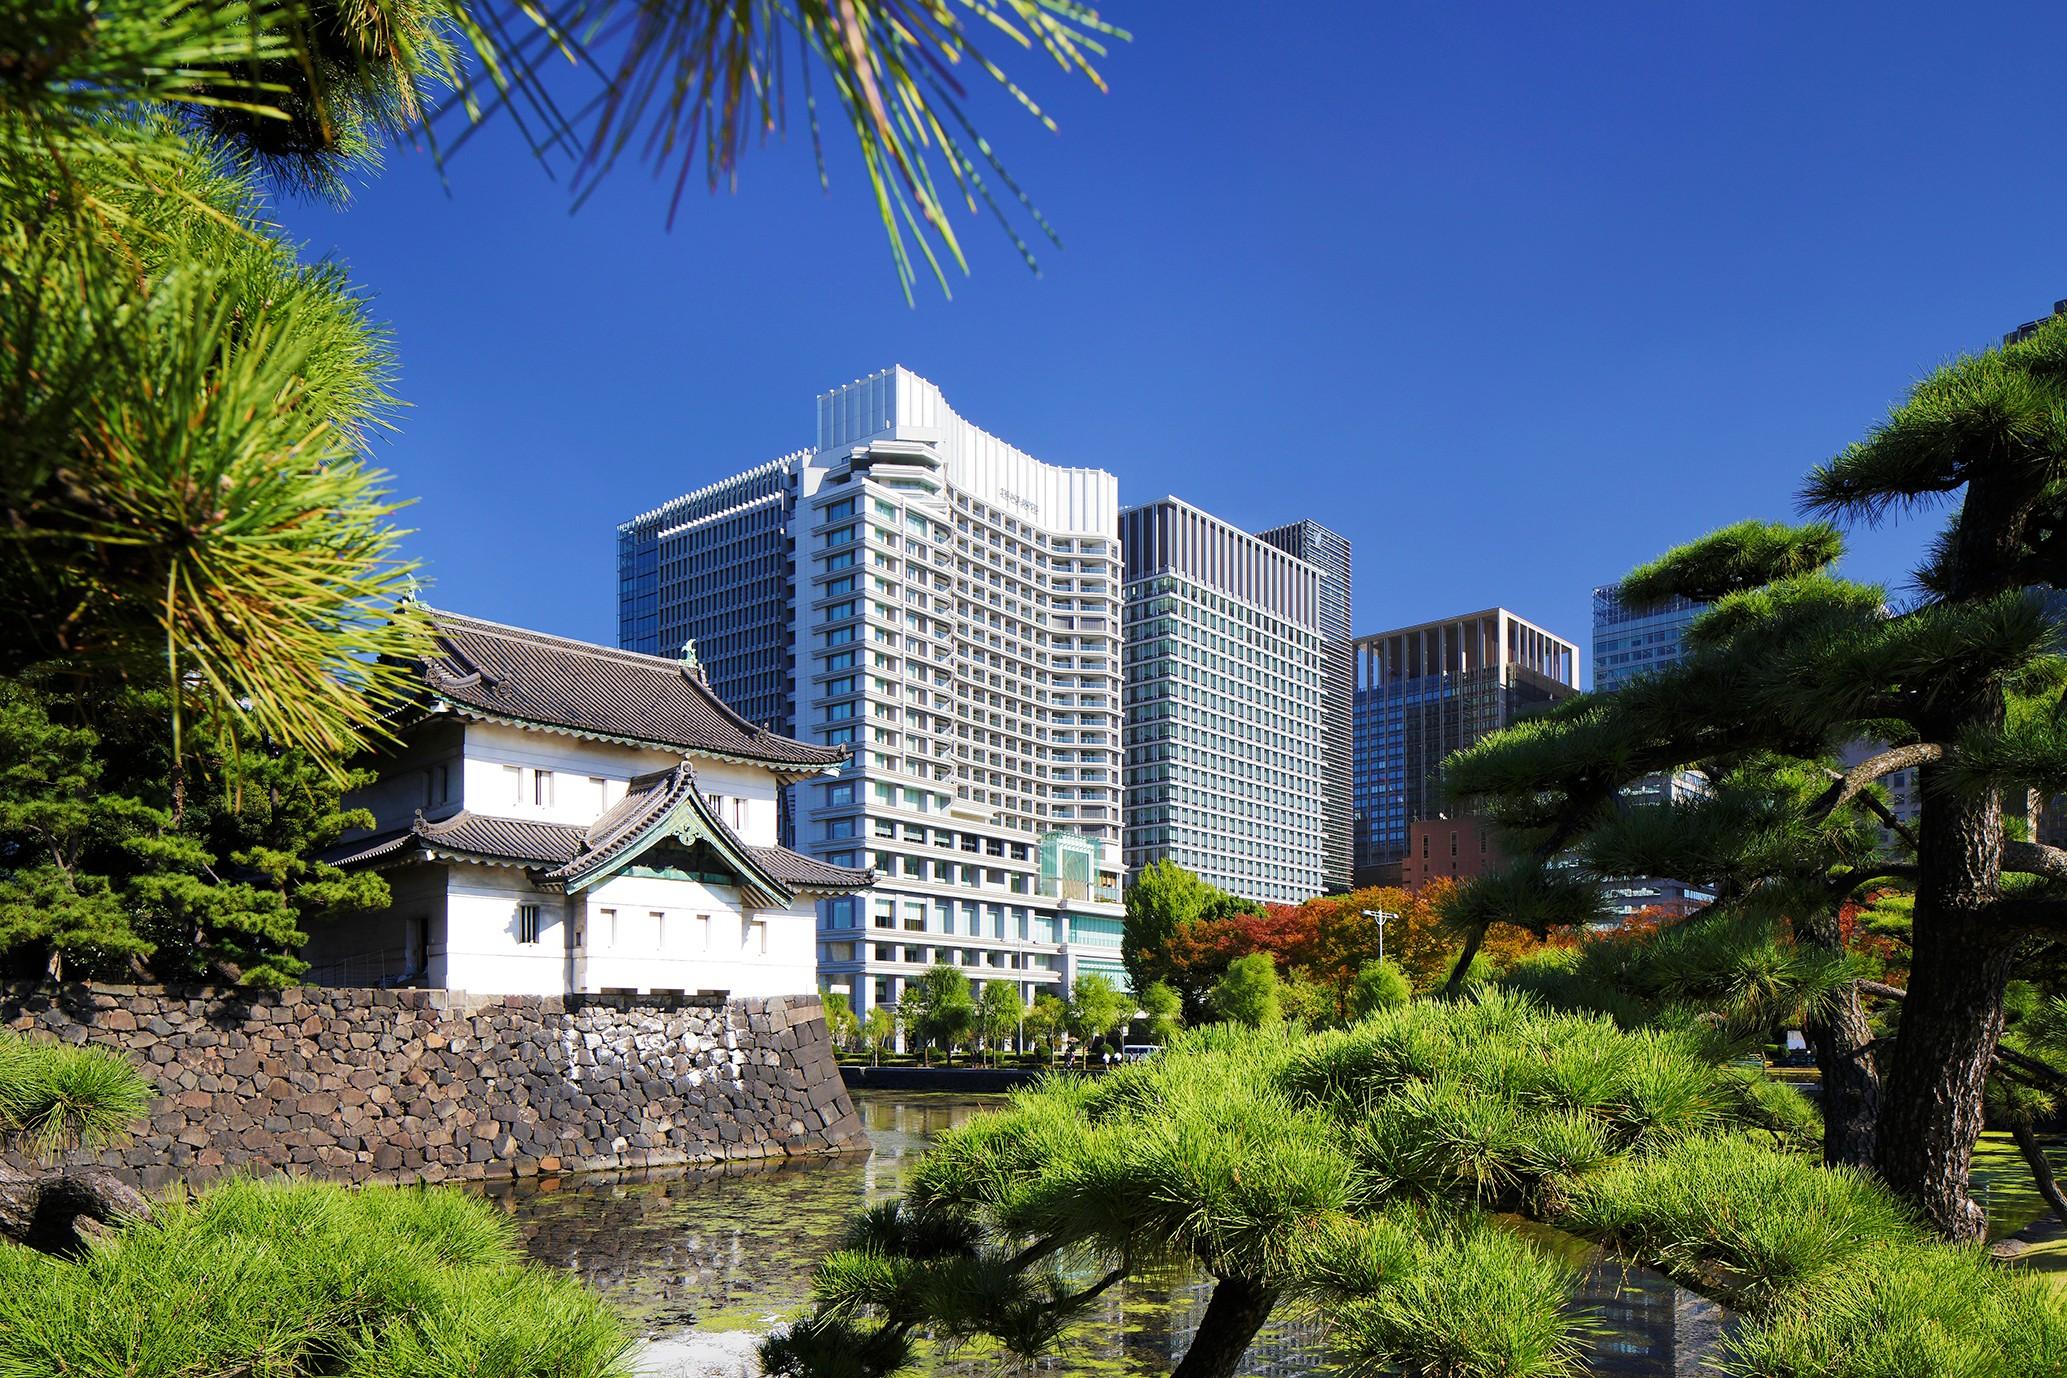 Tokyo Upholds Utmost Health Measures For Safe Travel